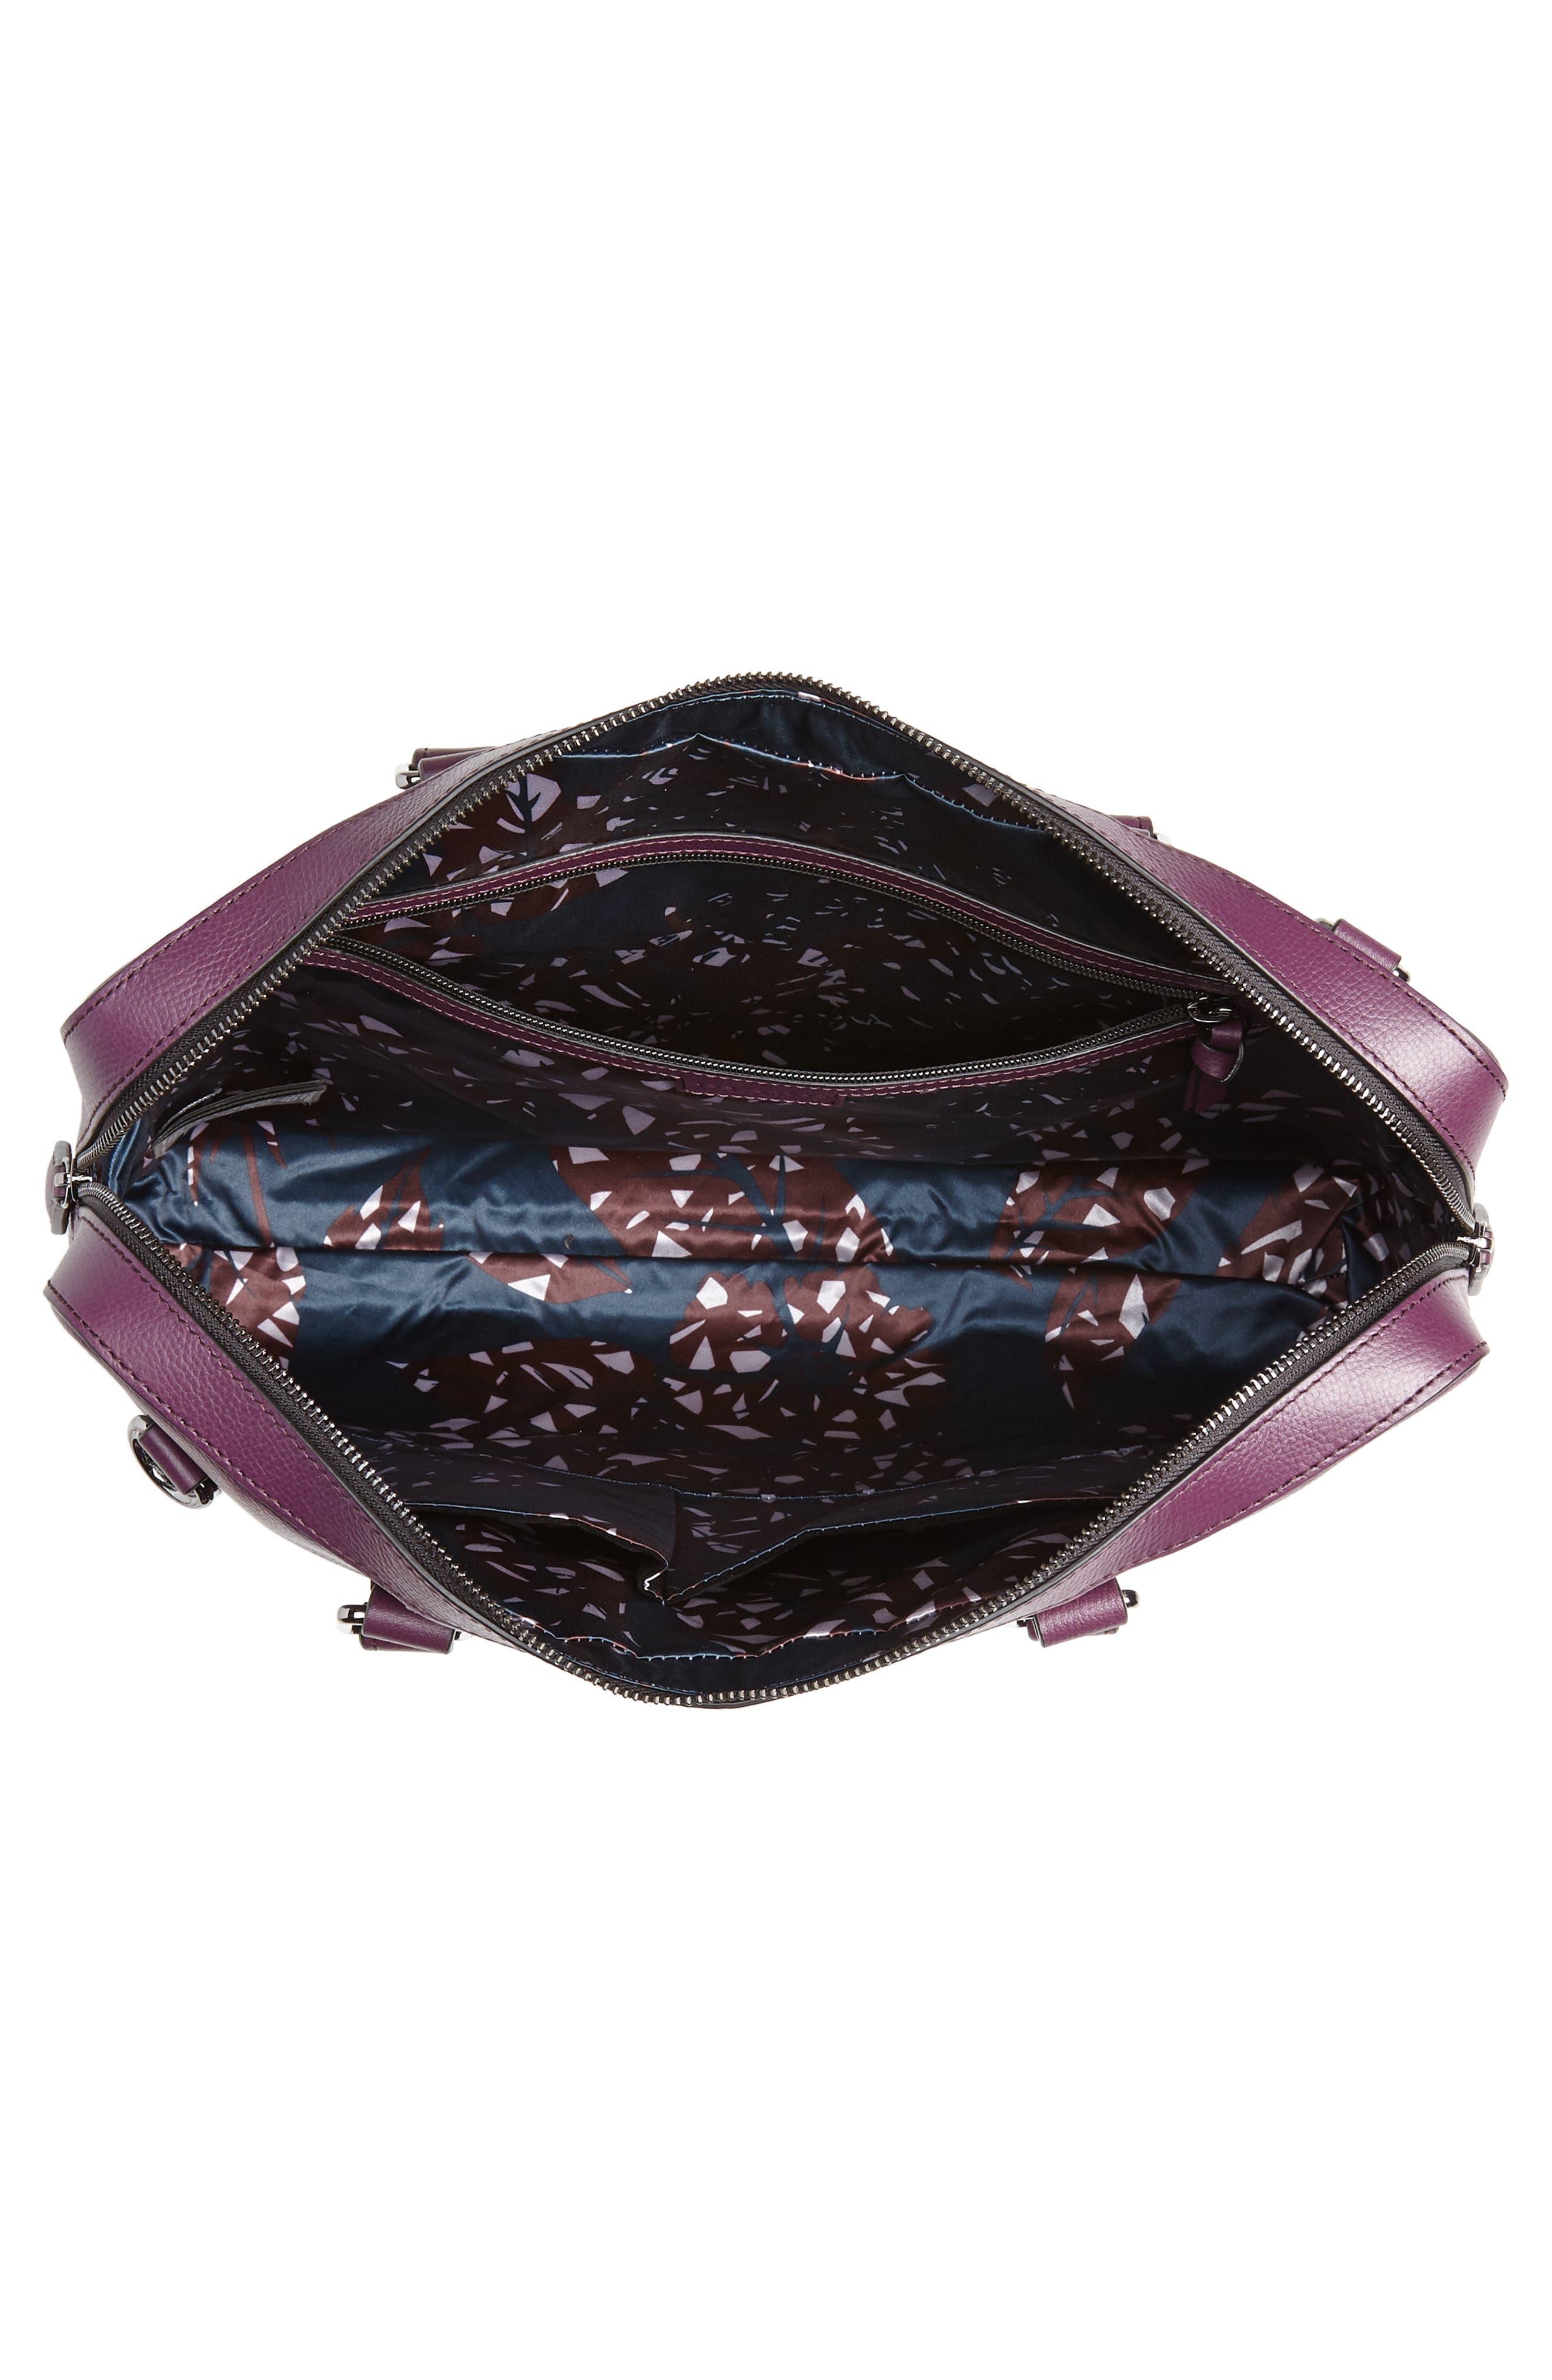 Hoooch Leather Briefcase,                             Alternate thumbnail 4, color,                             DEEP PURPLE